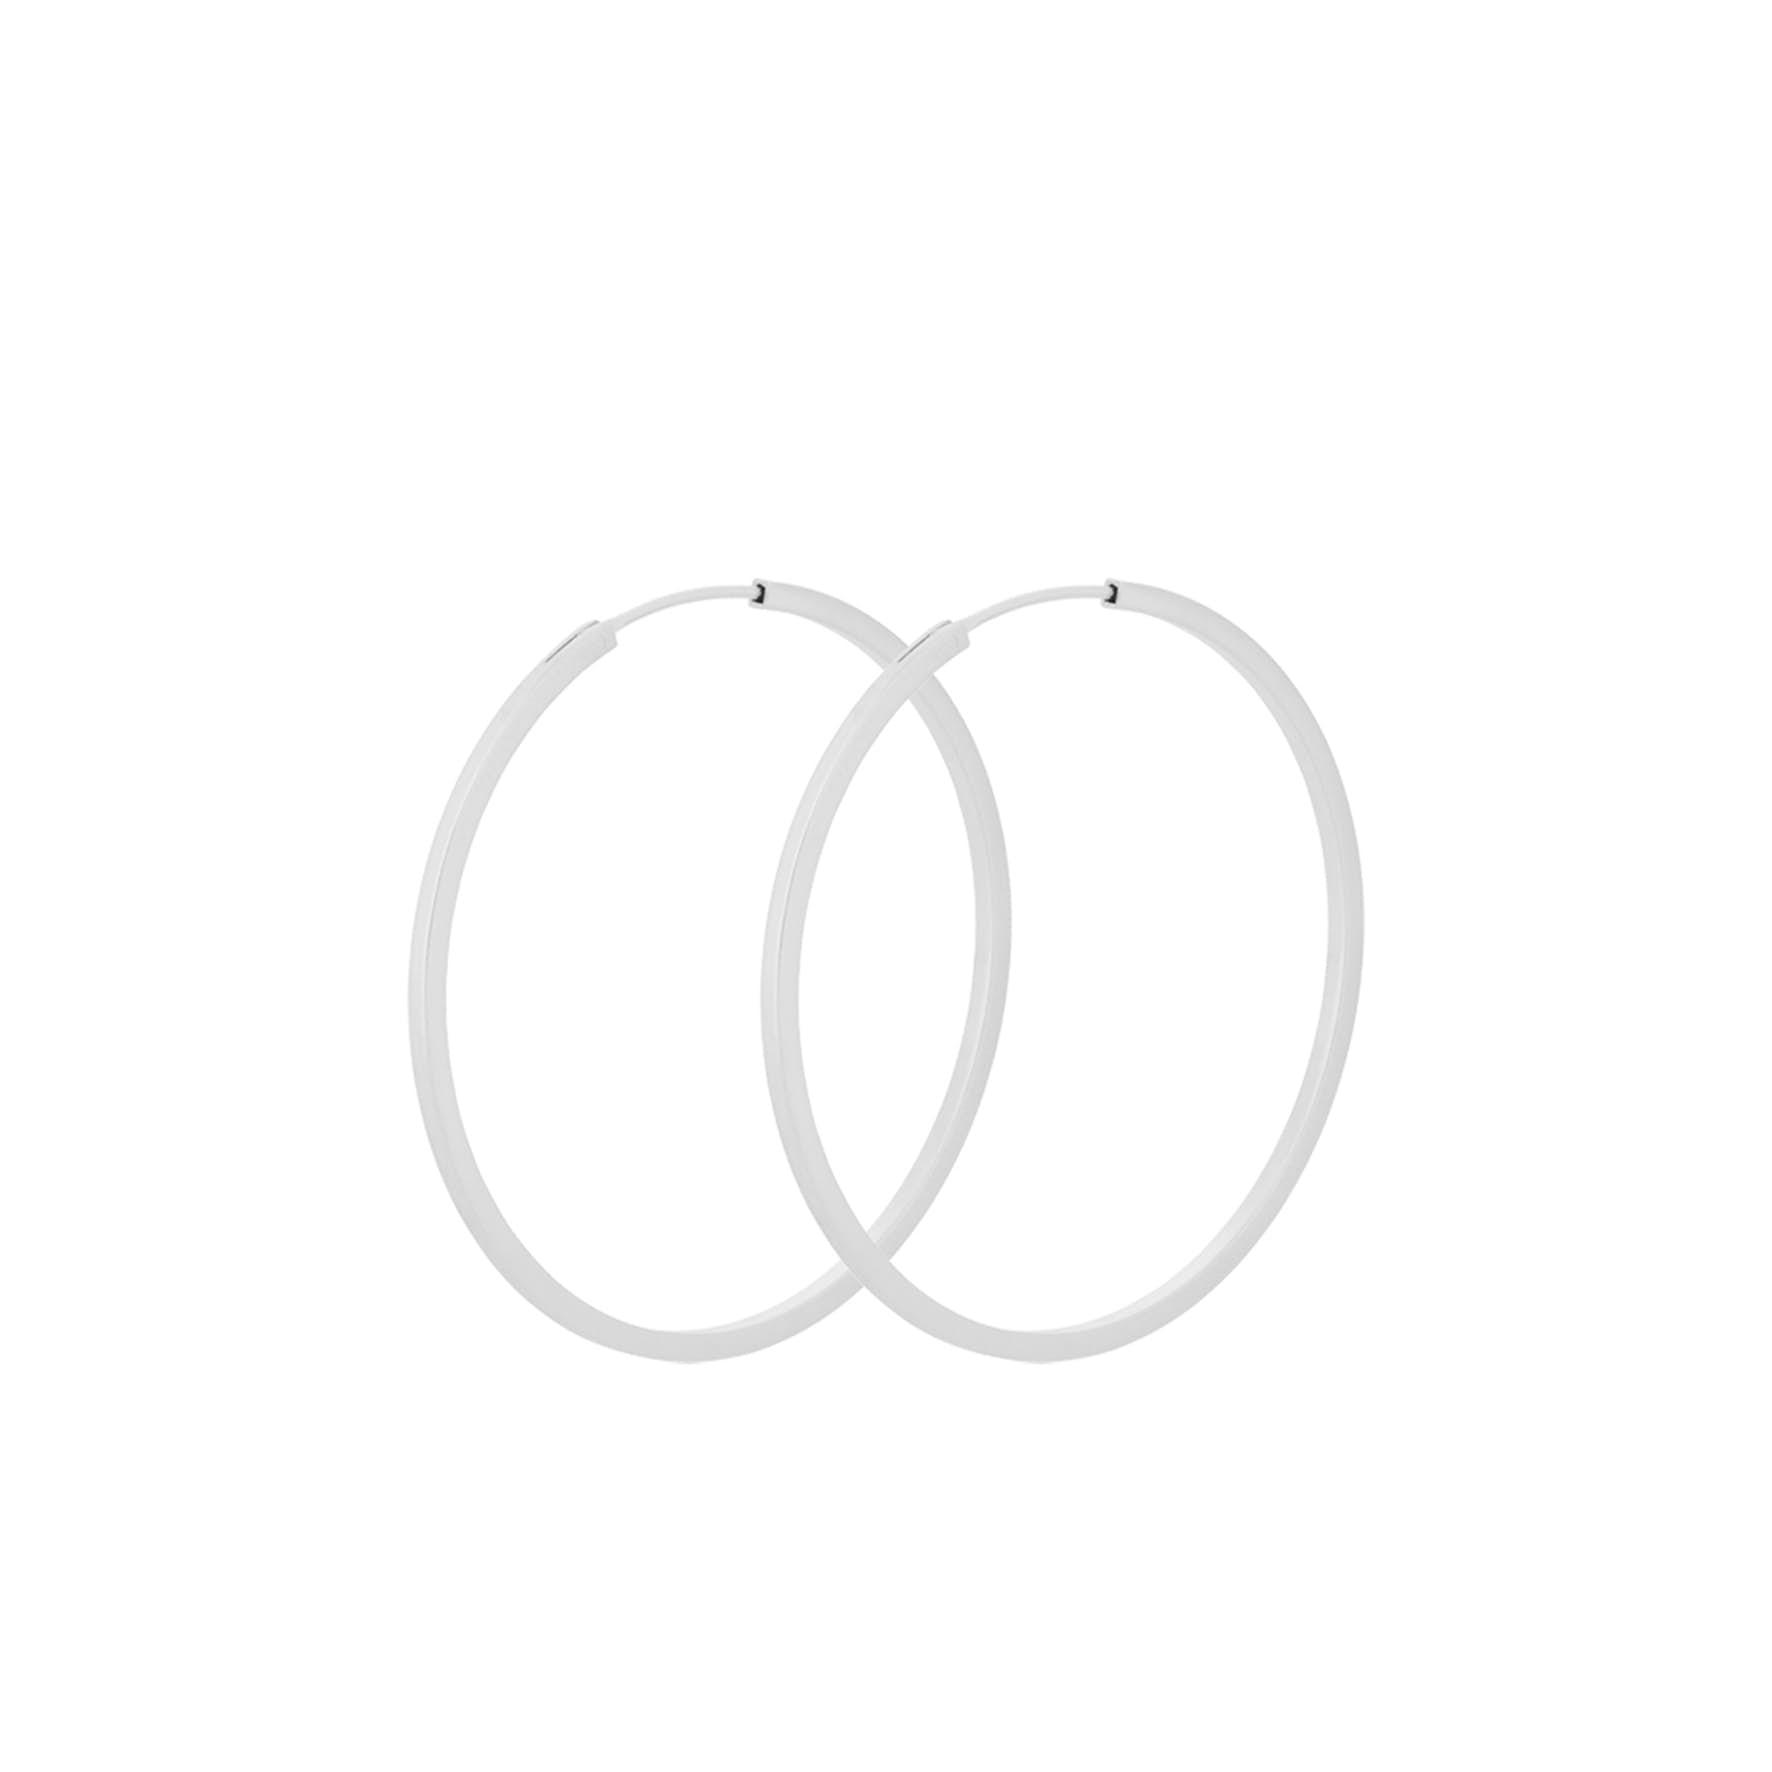 Small Orbit Hoops von Pernille Corydon in Silber Sterling 925